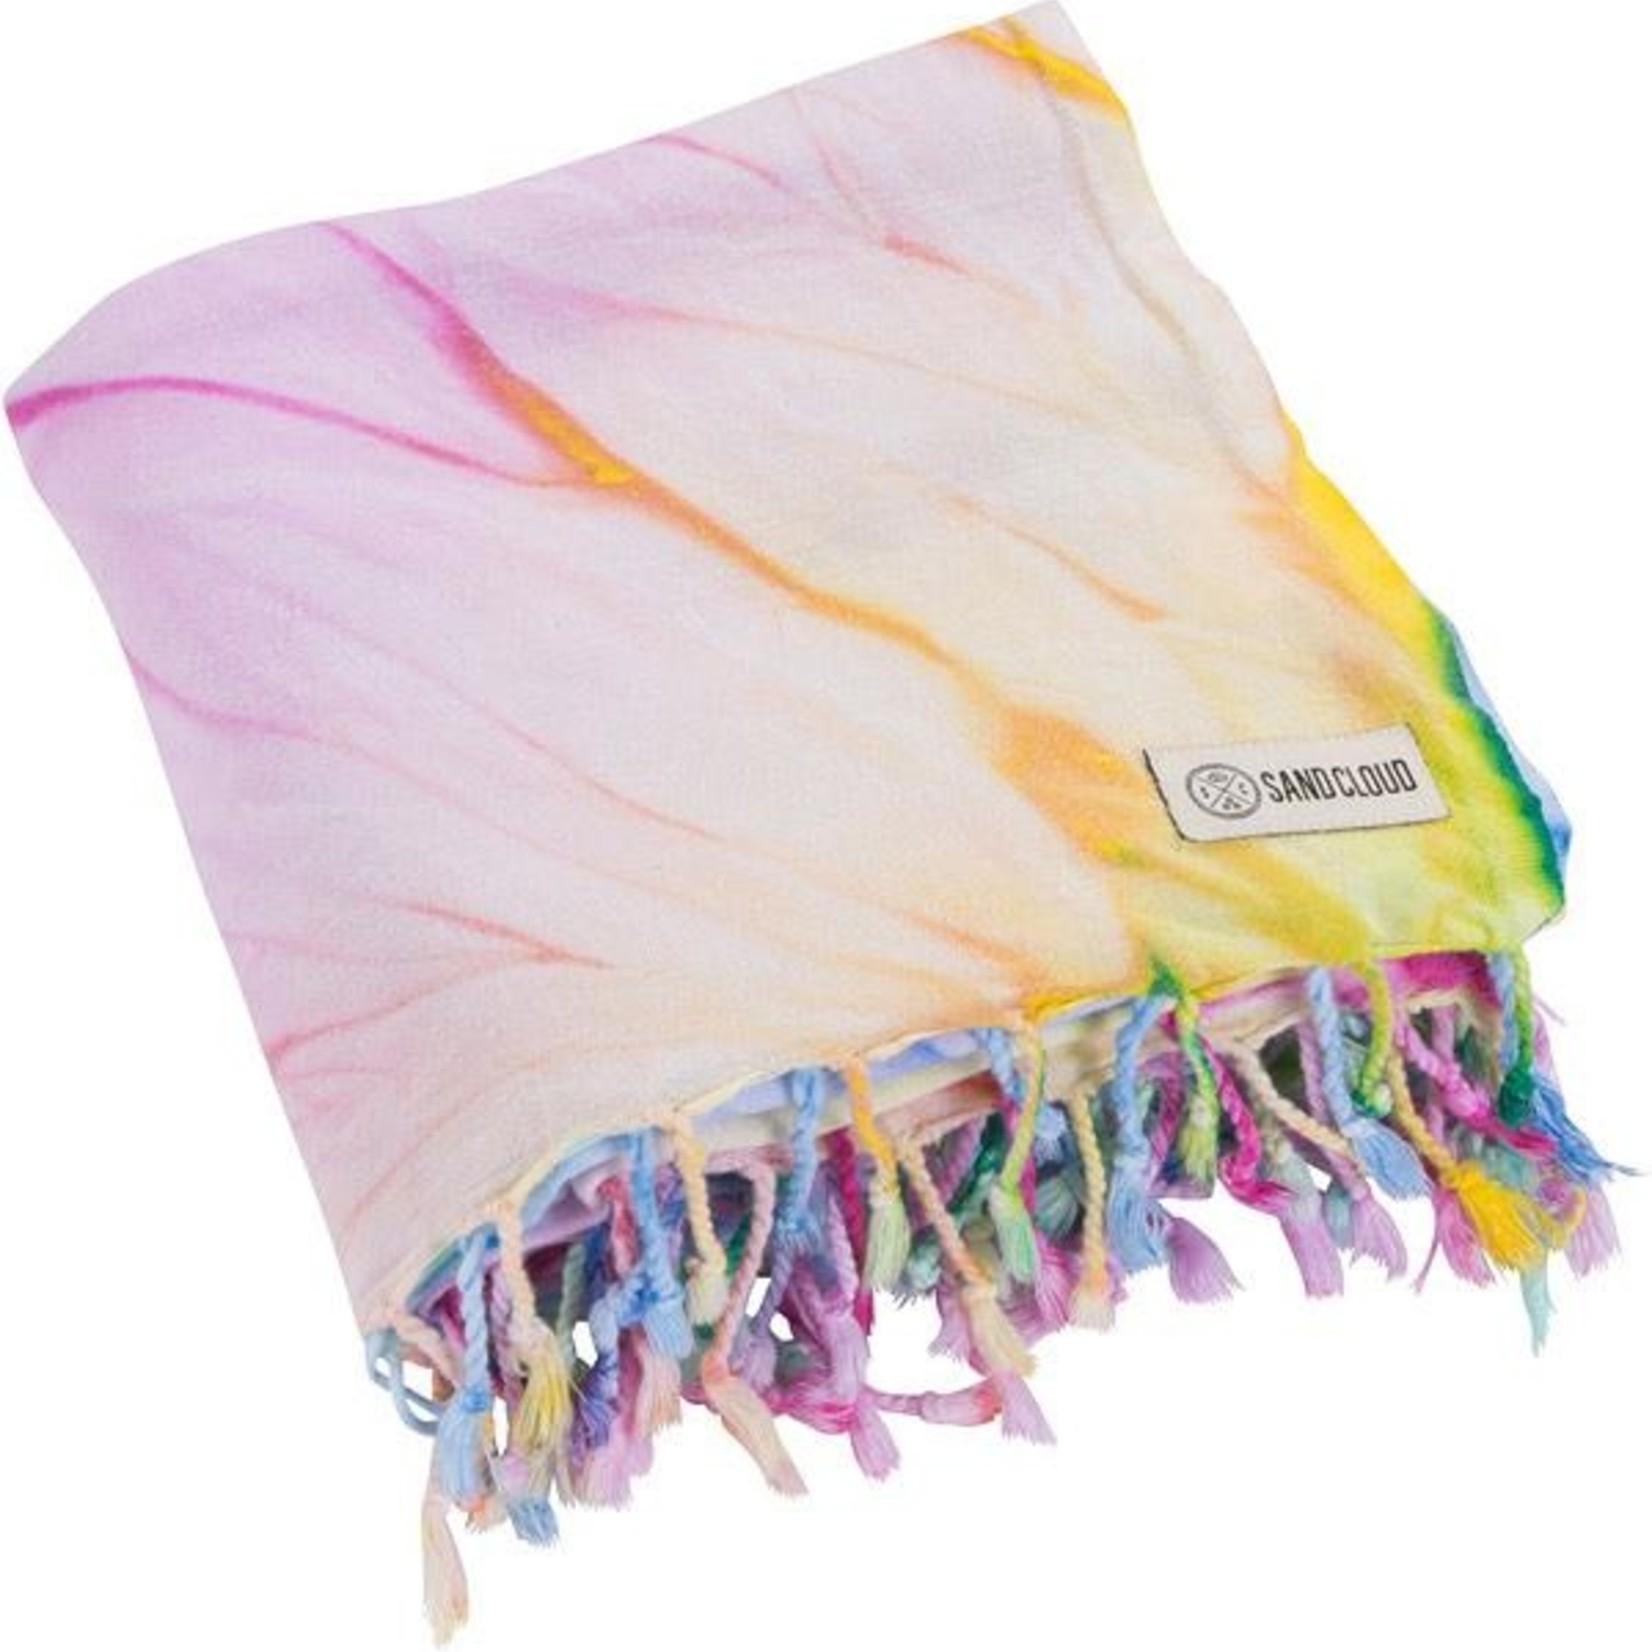 Sand Cloud Wanderlust XL Towel